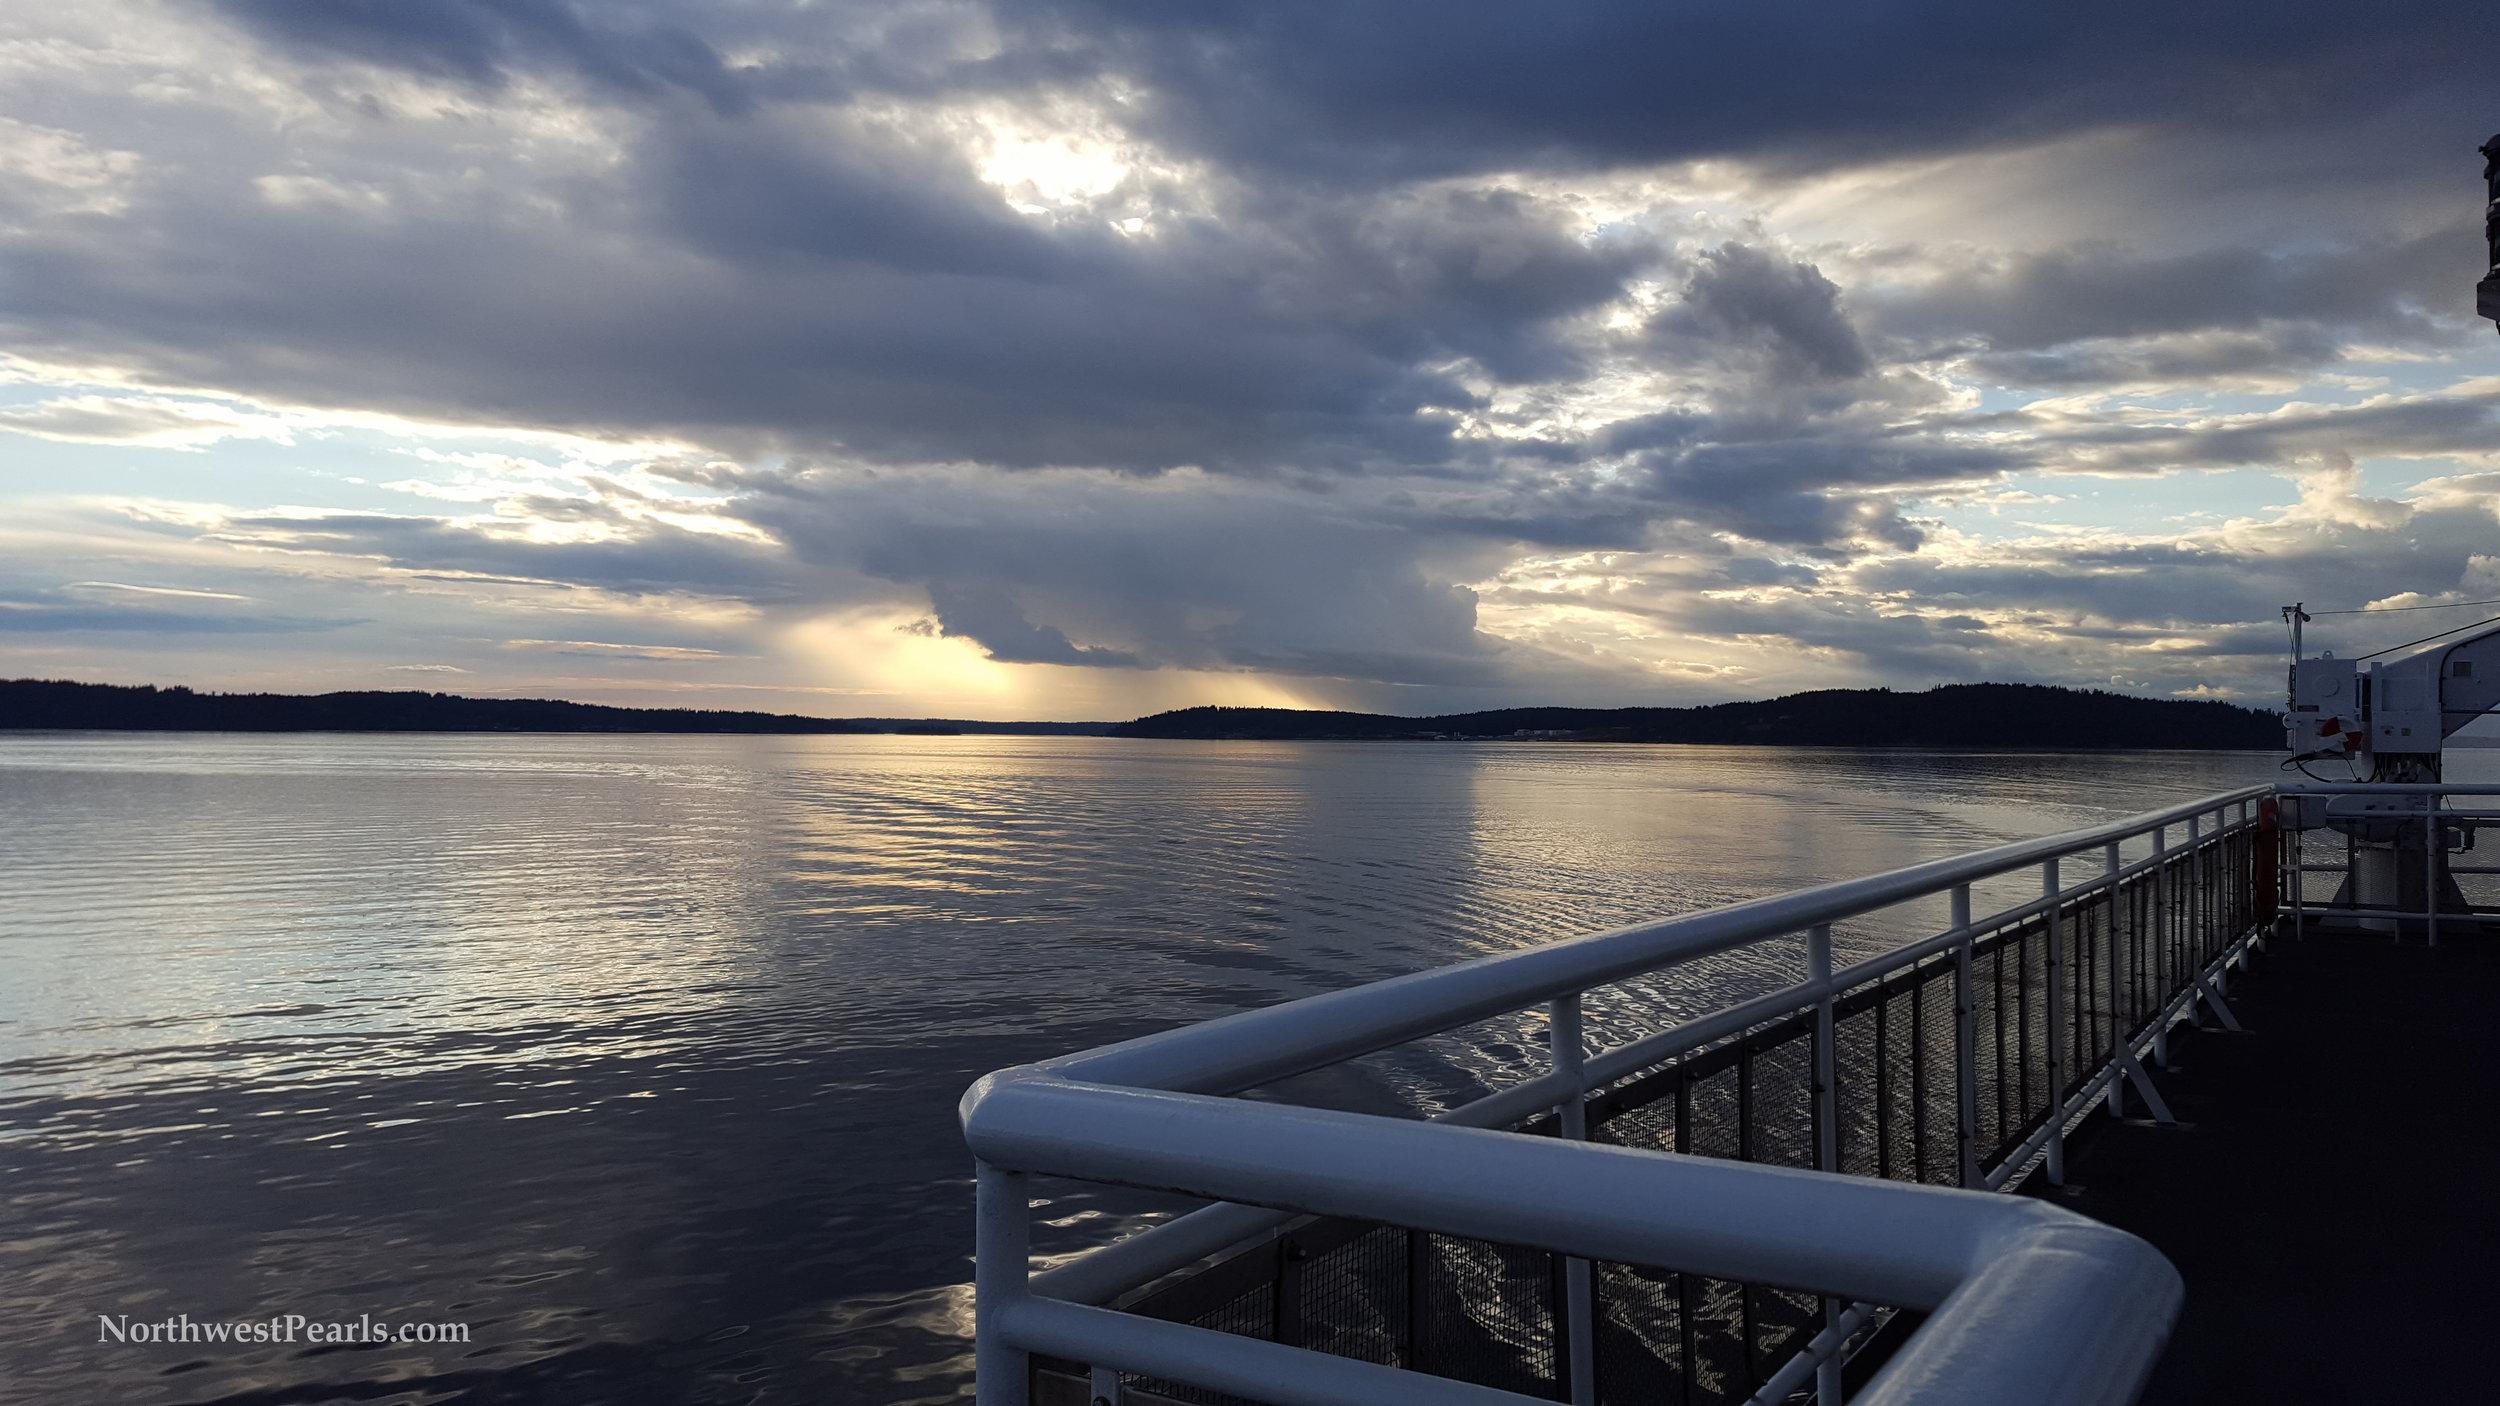 Northwest Pearls: Anderson Island